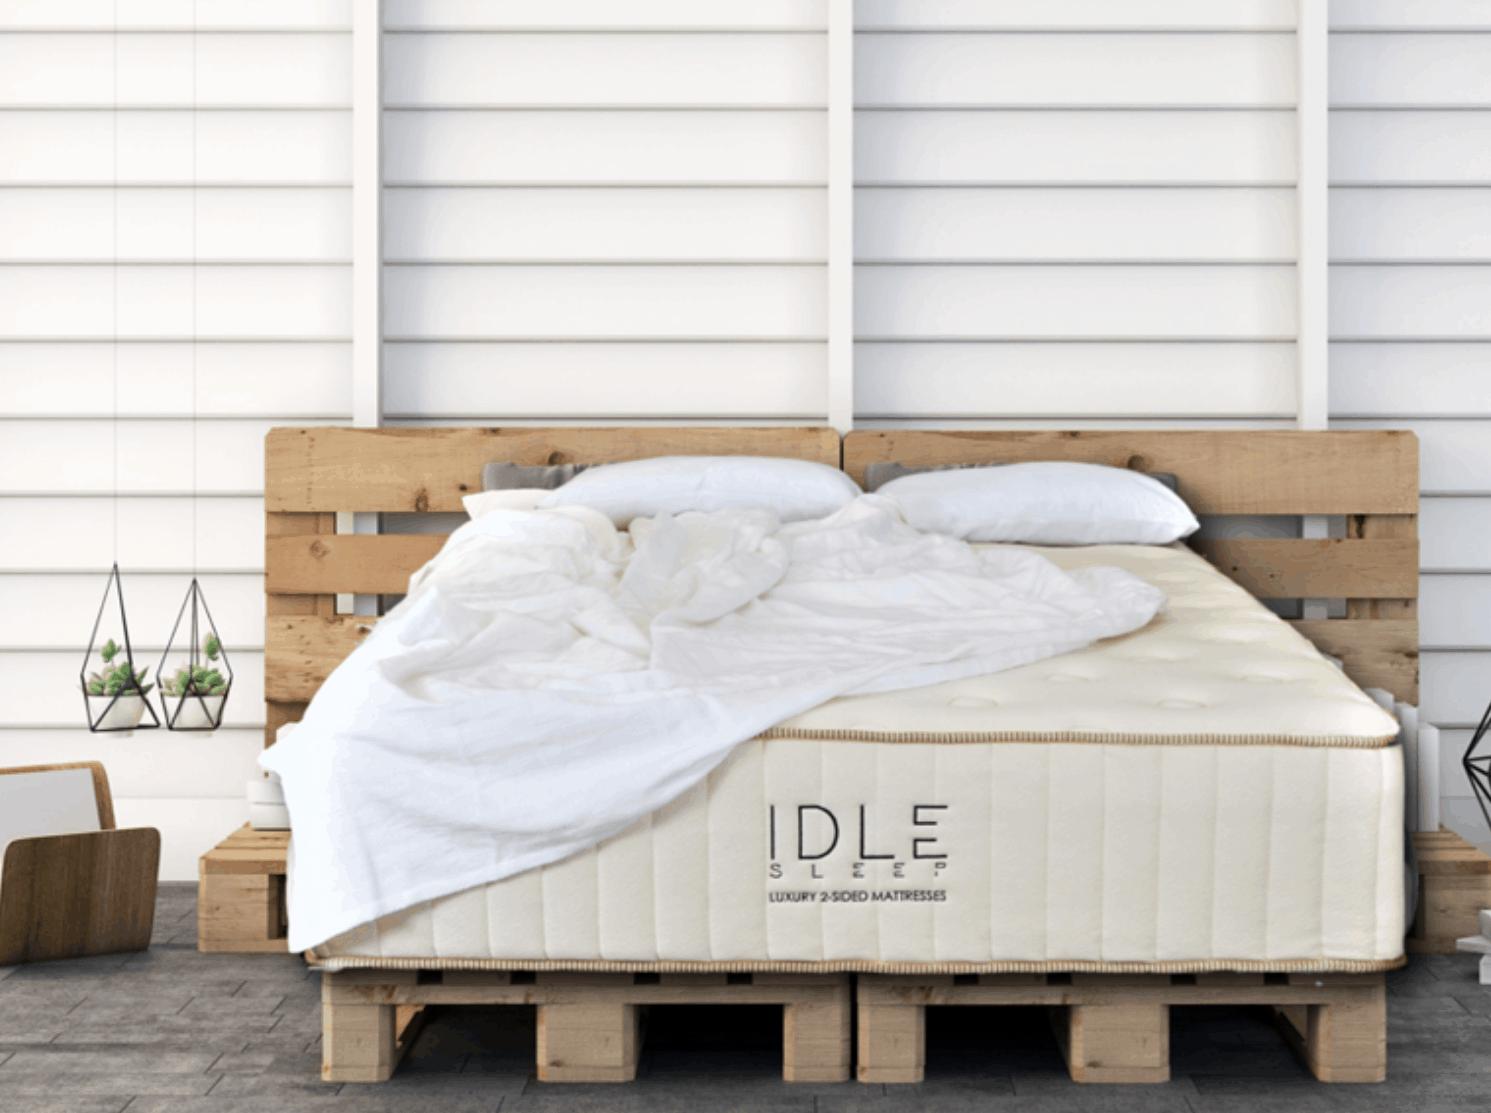 Idle Sleep Latex Hybrid Mattress Review(14″)